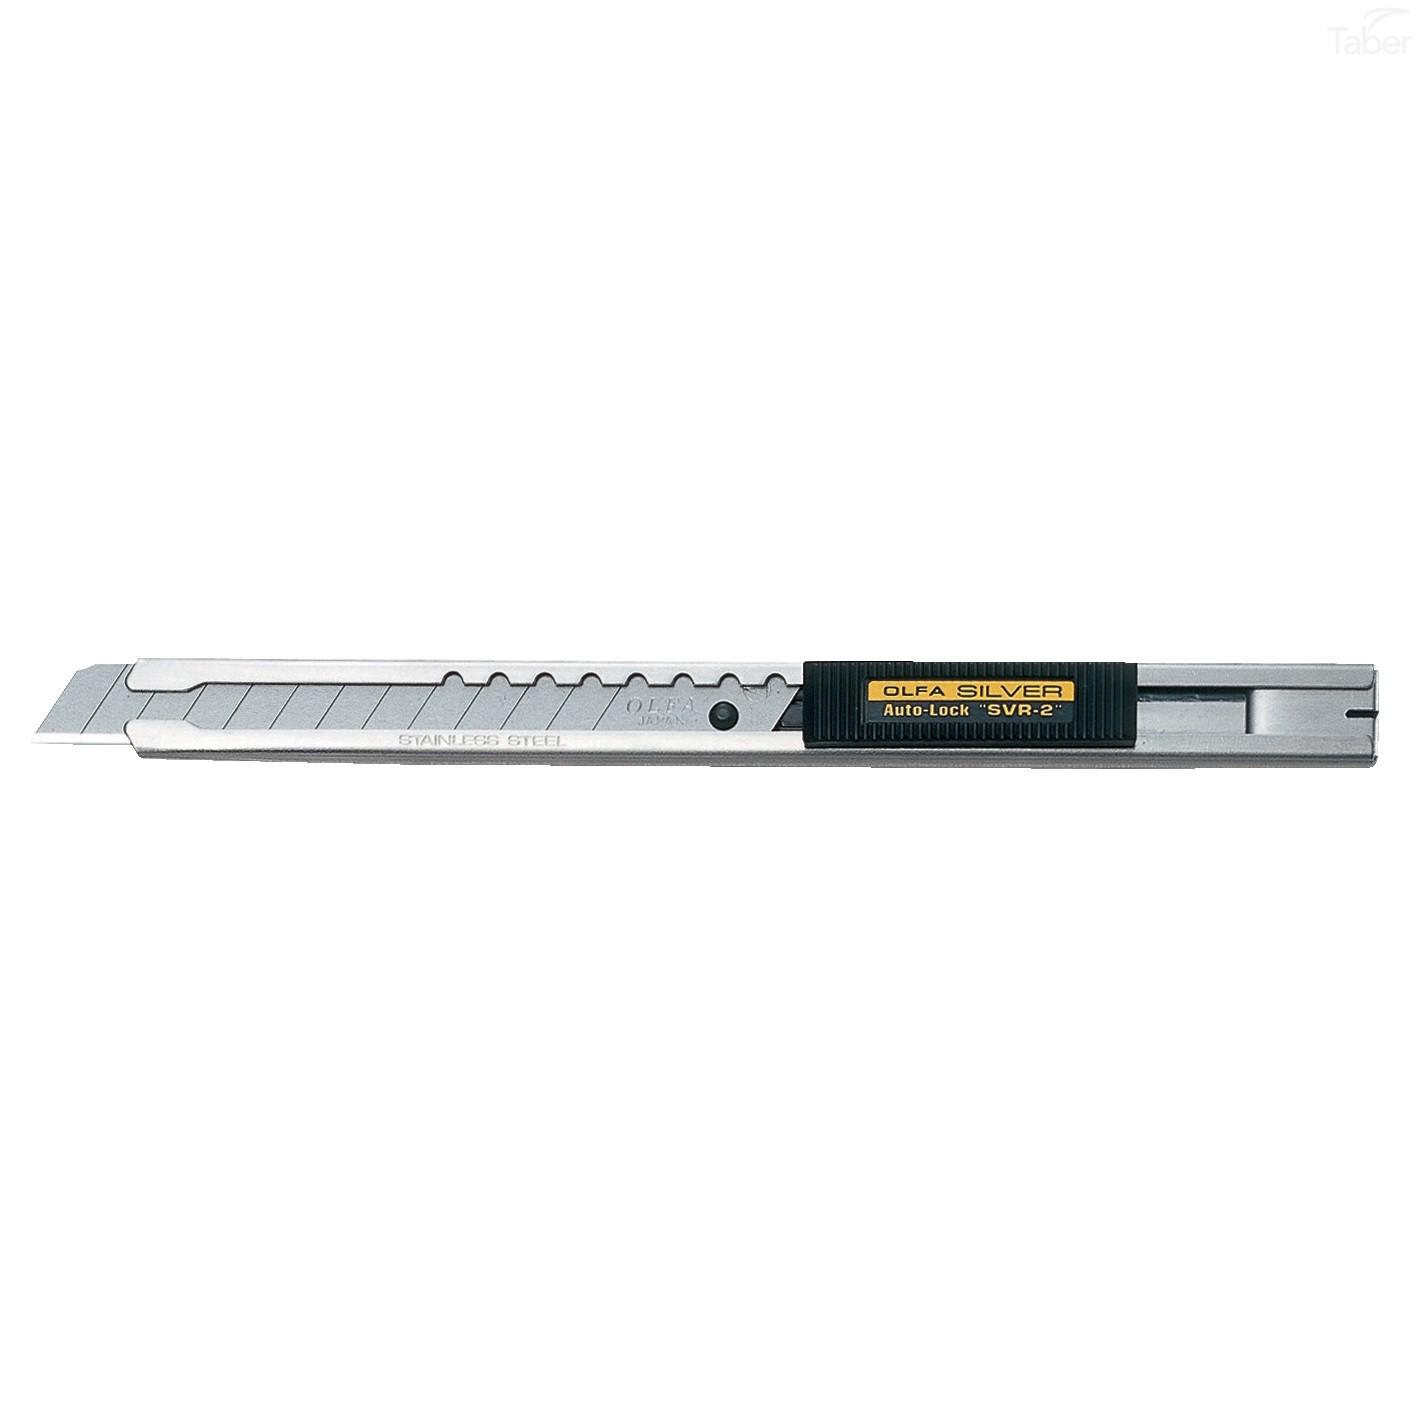 Olfa SVR-2 Silver Auto Lock Stainless Steel Cutter